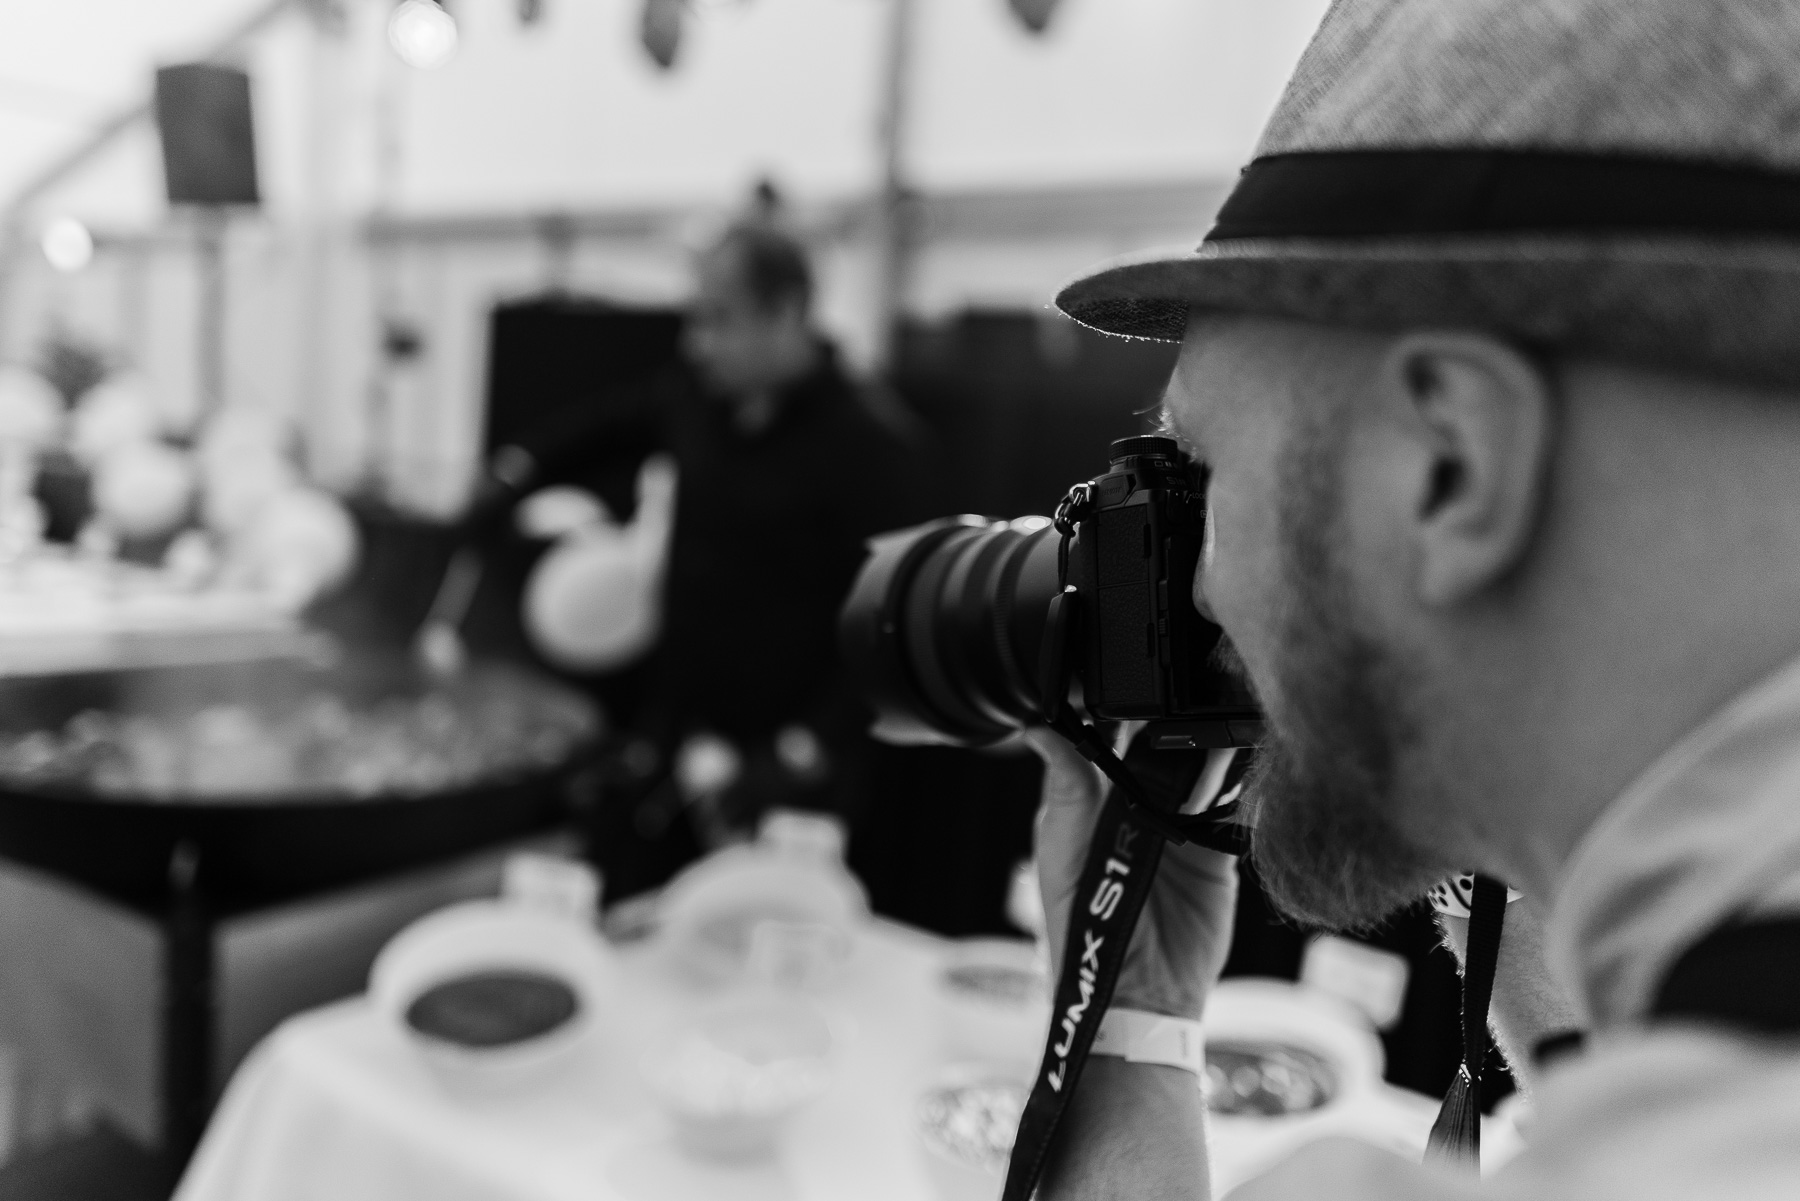 Fotos eines Abiballs/Abifeier im Bachclub Nethen Rastede, Fotograf Thomas Weber aus Oldenburg